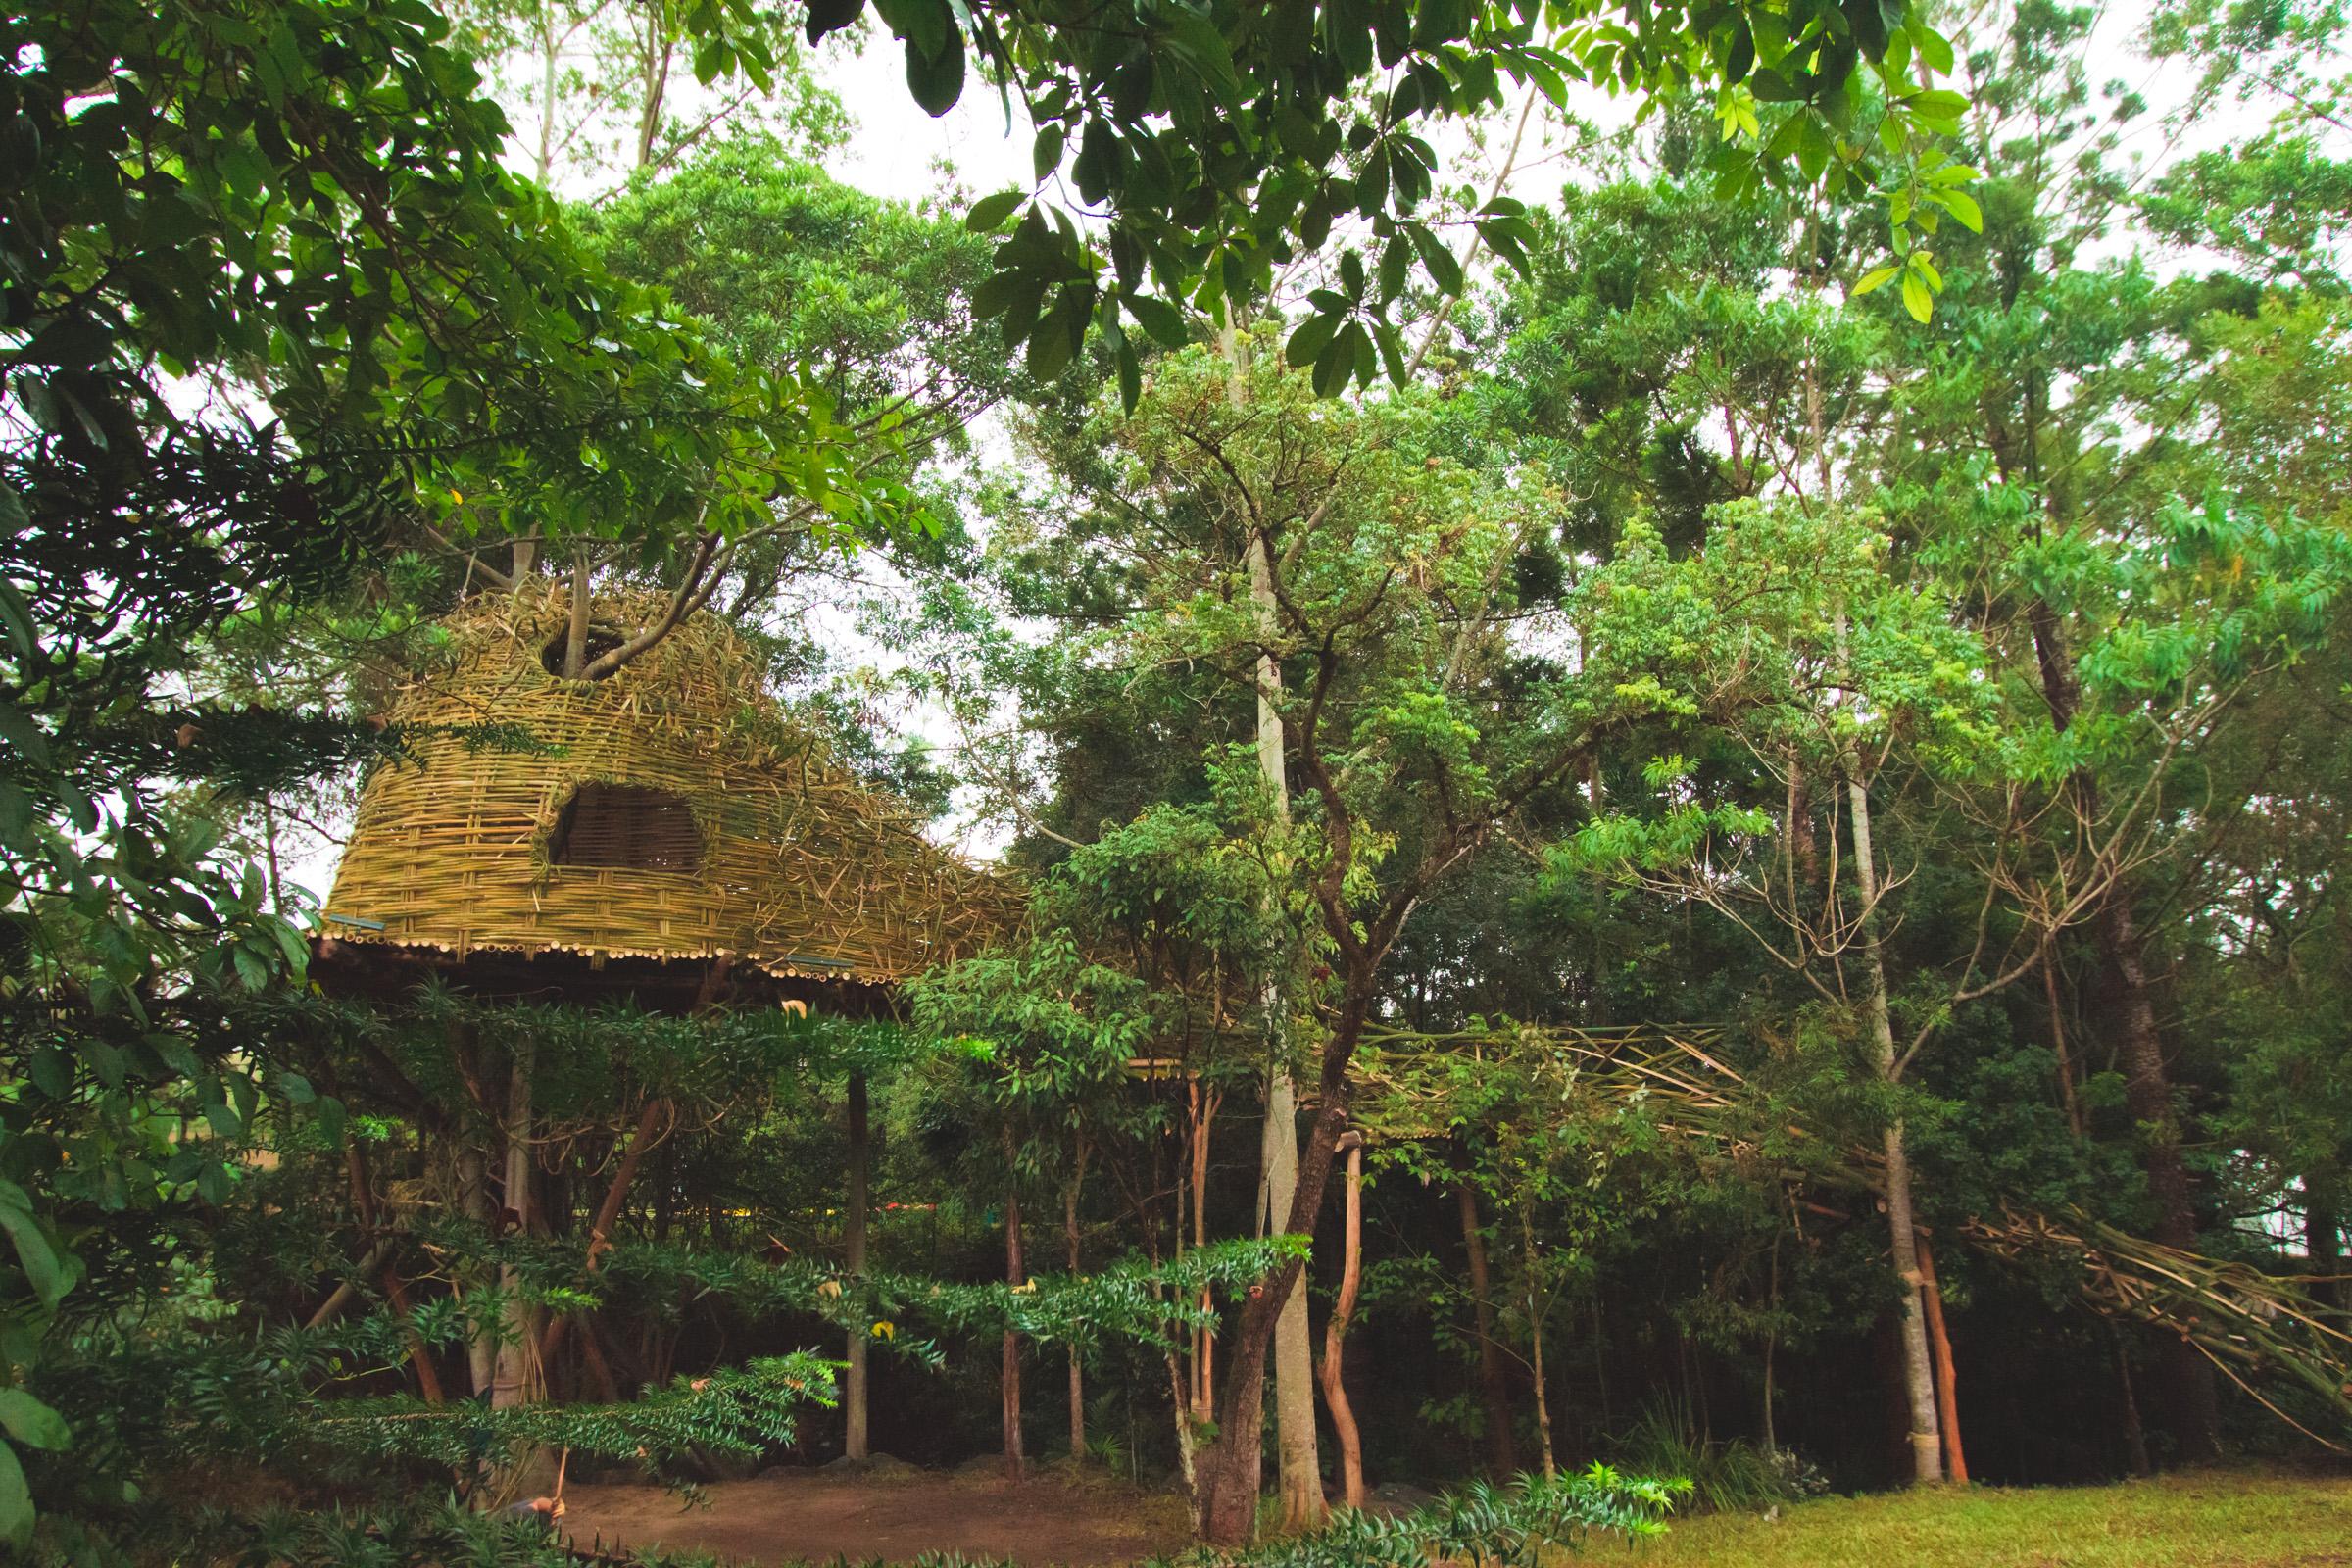 Tree house photography by Mercurio Alvarado  (31 of 132).jpg